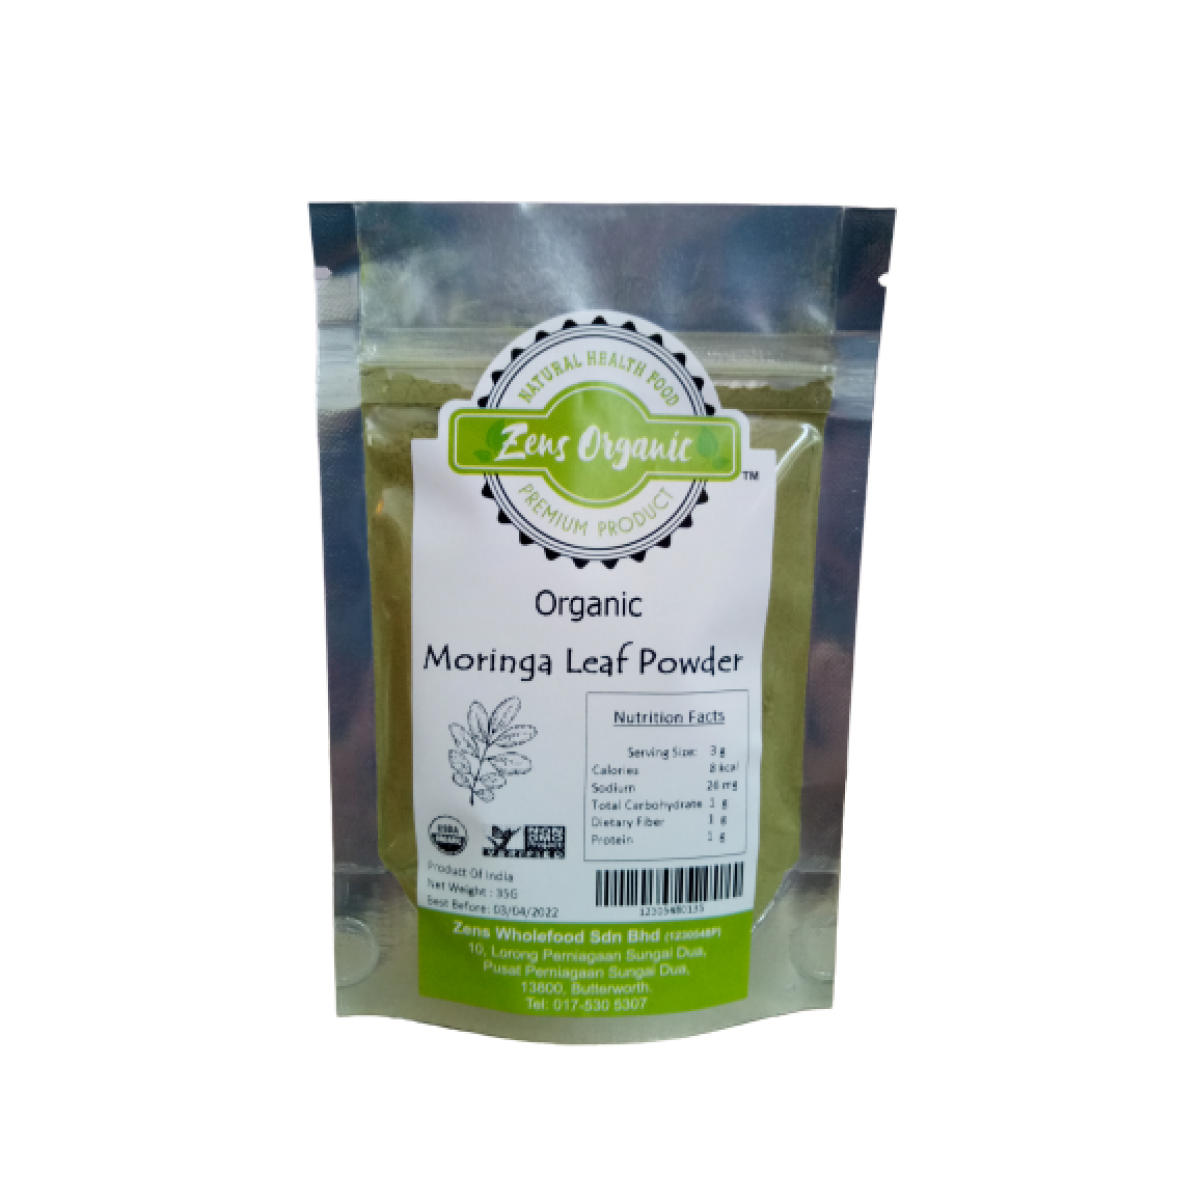 Zens Organic Moringa Leaf Powder- 35g